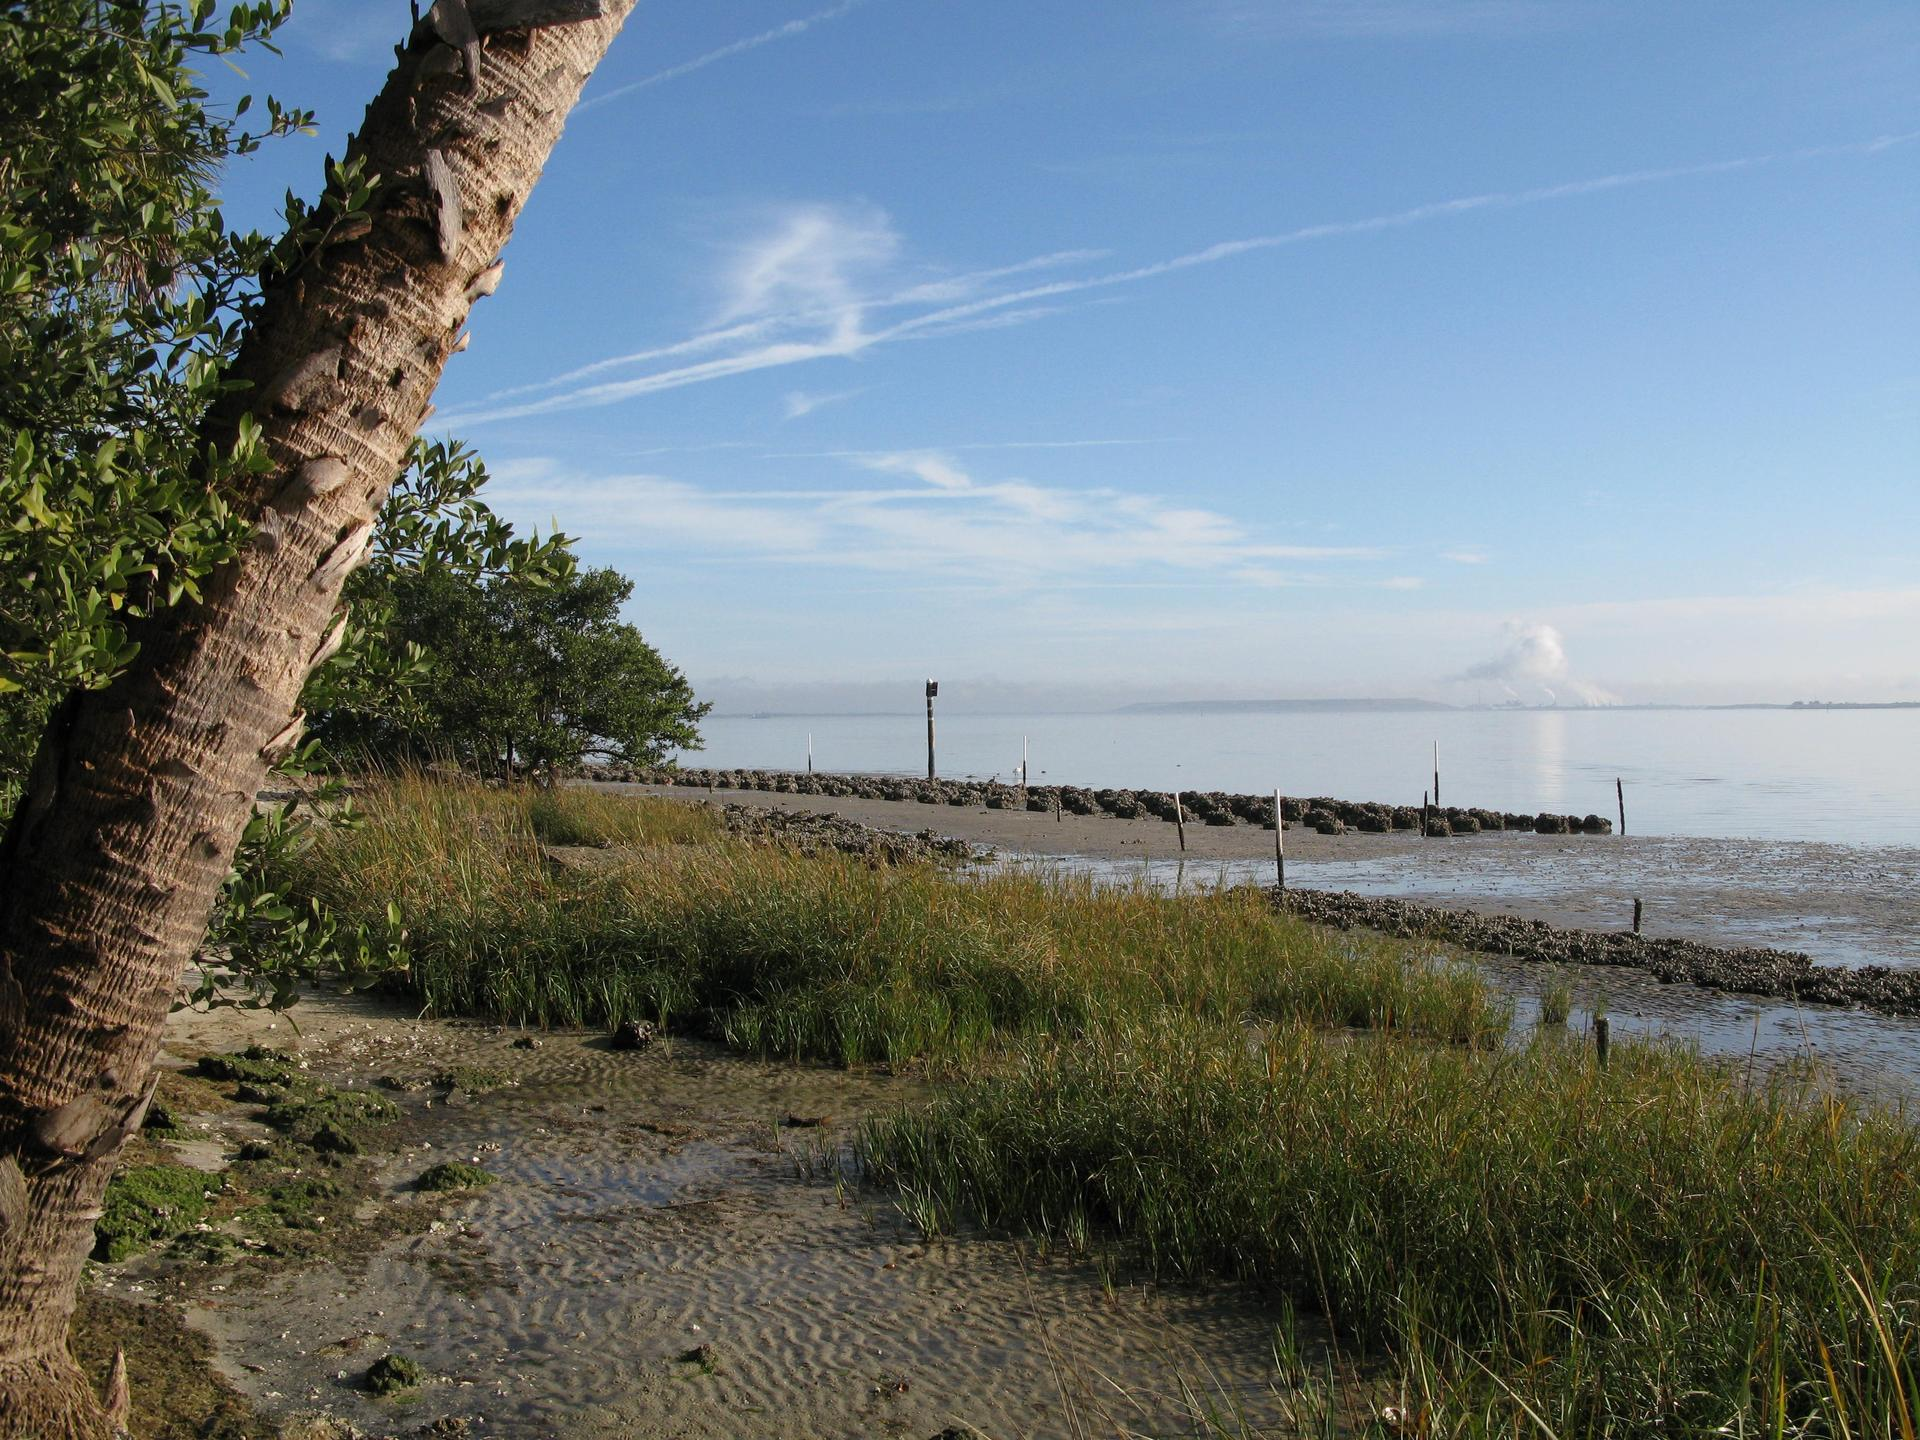 Marsh and oyster reef habitat restoration MacDill AFB, Tampa, Florida